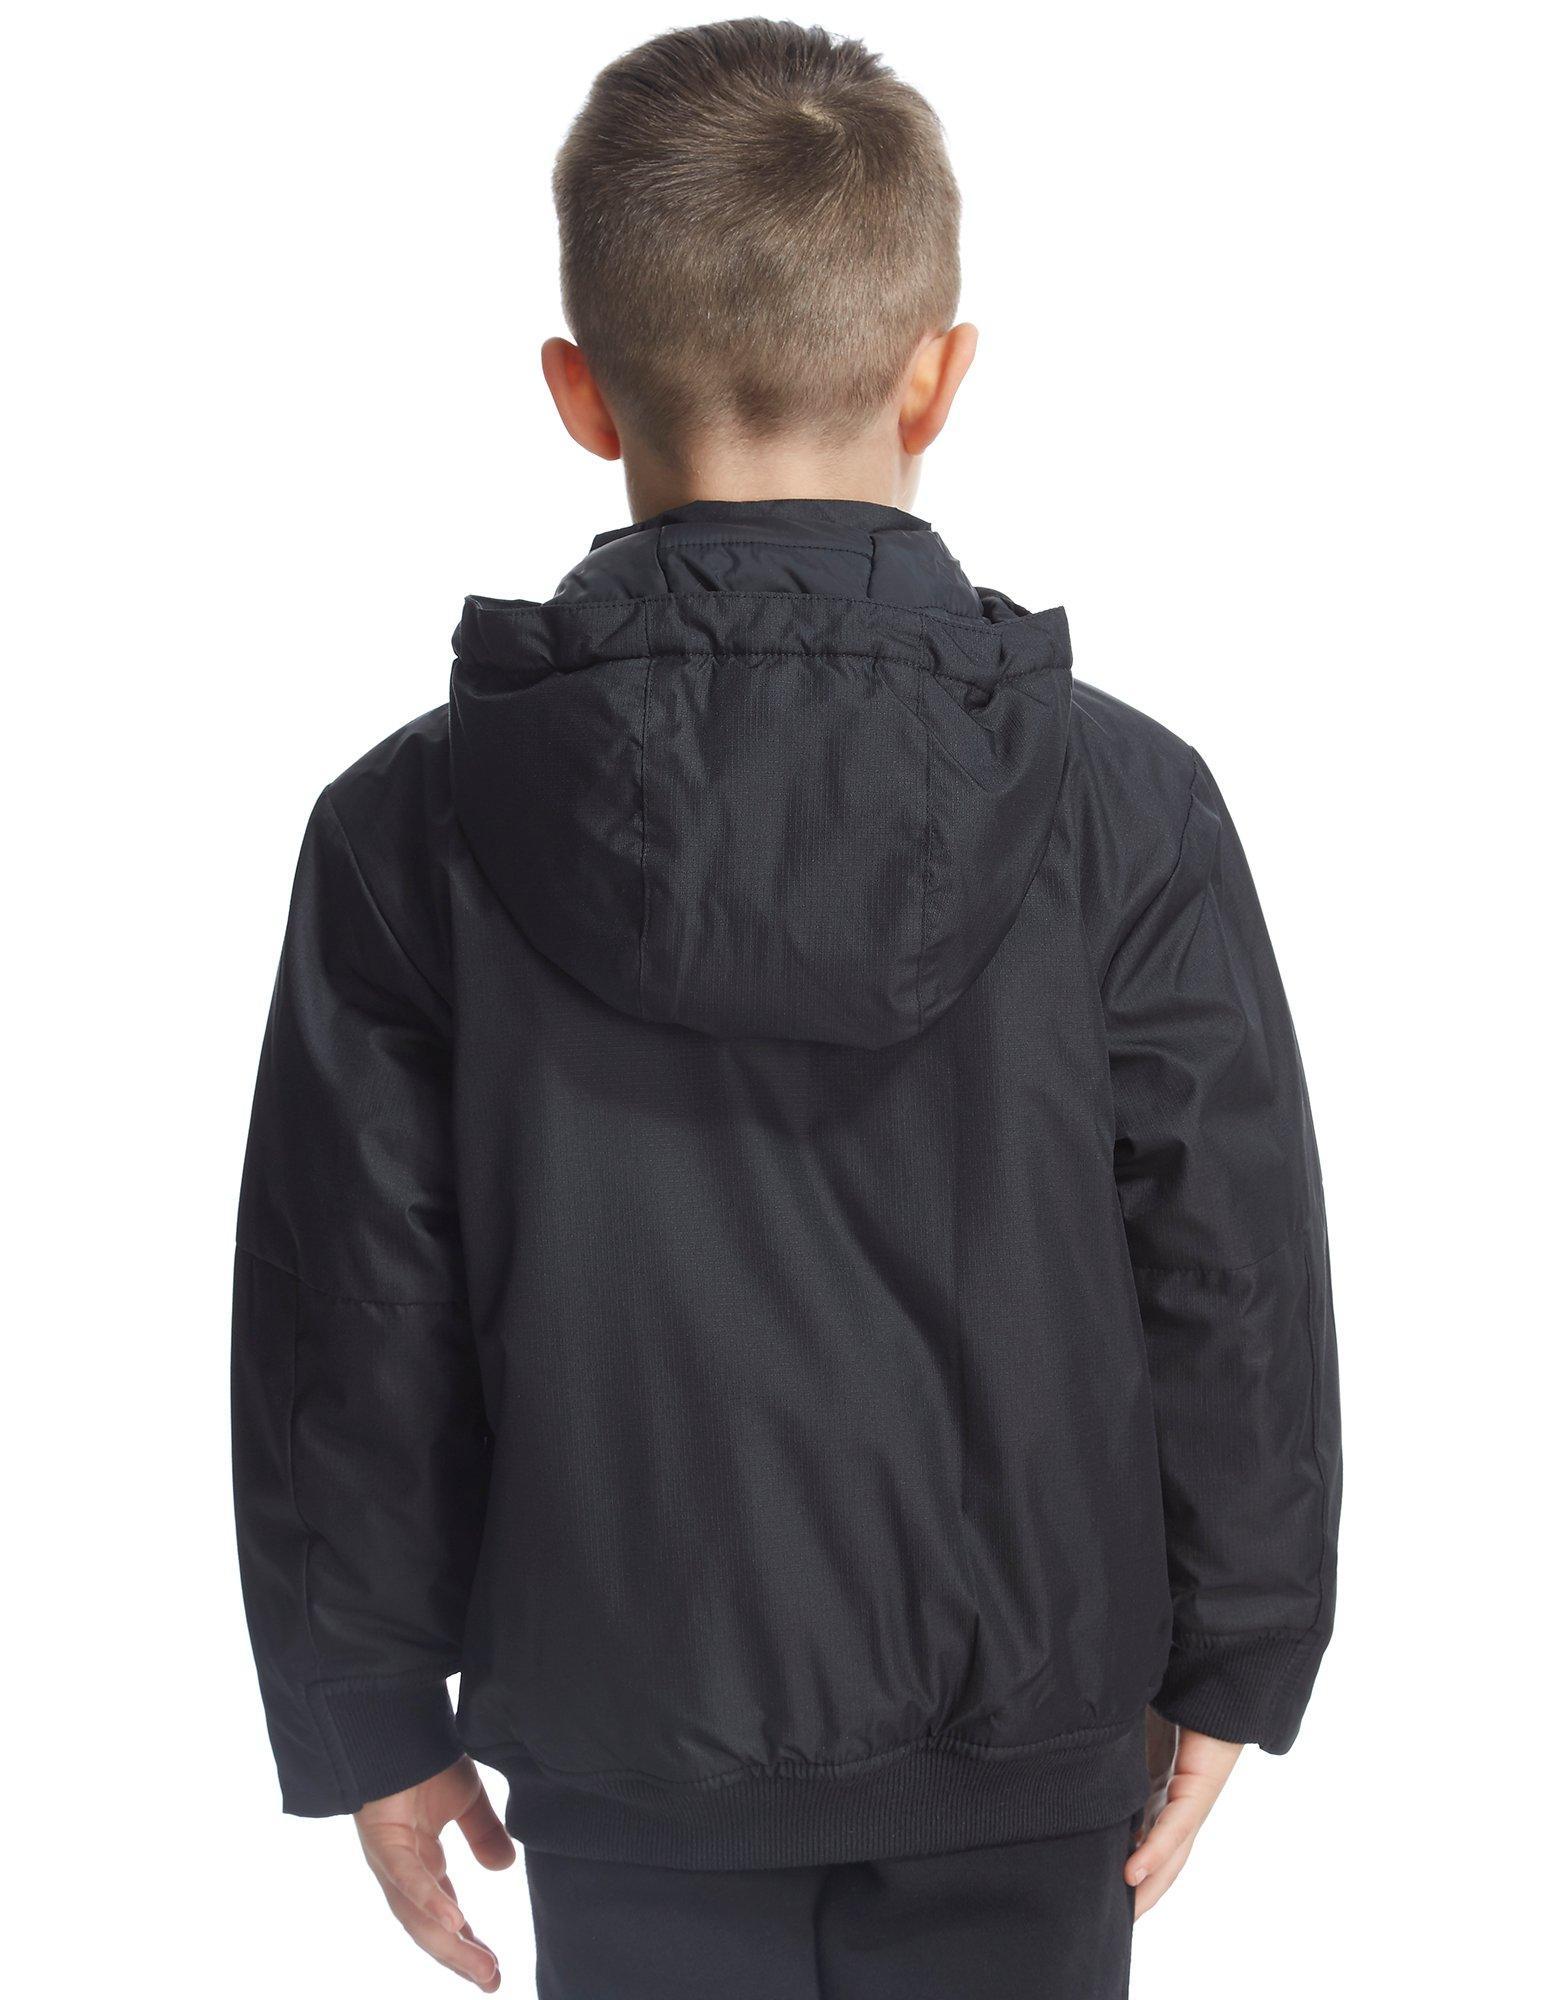 nike jakker til børn